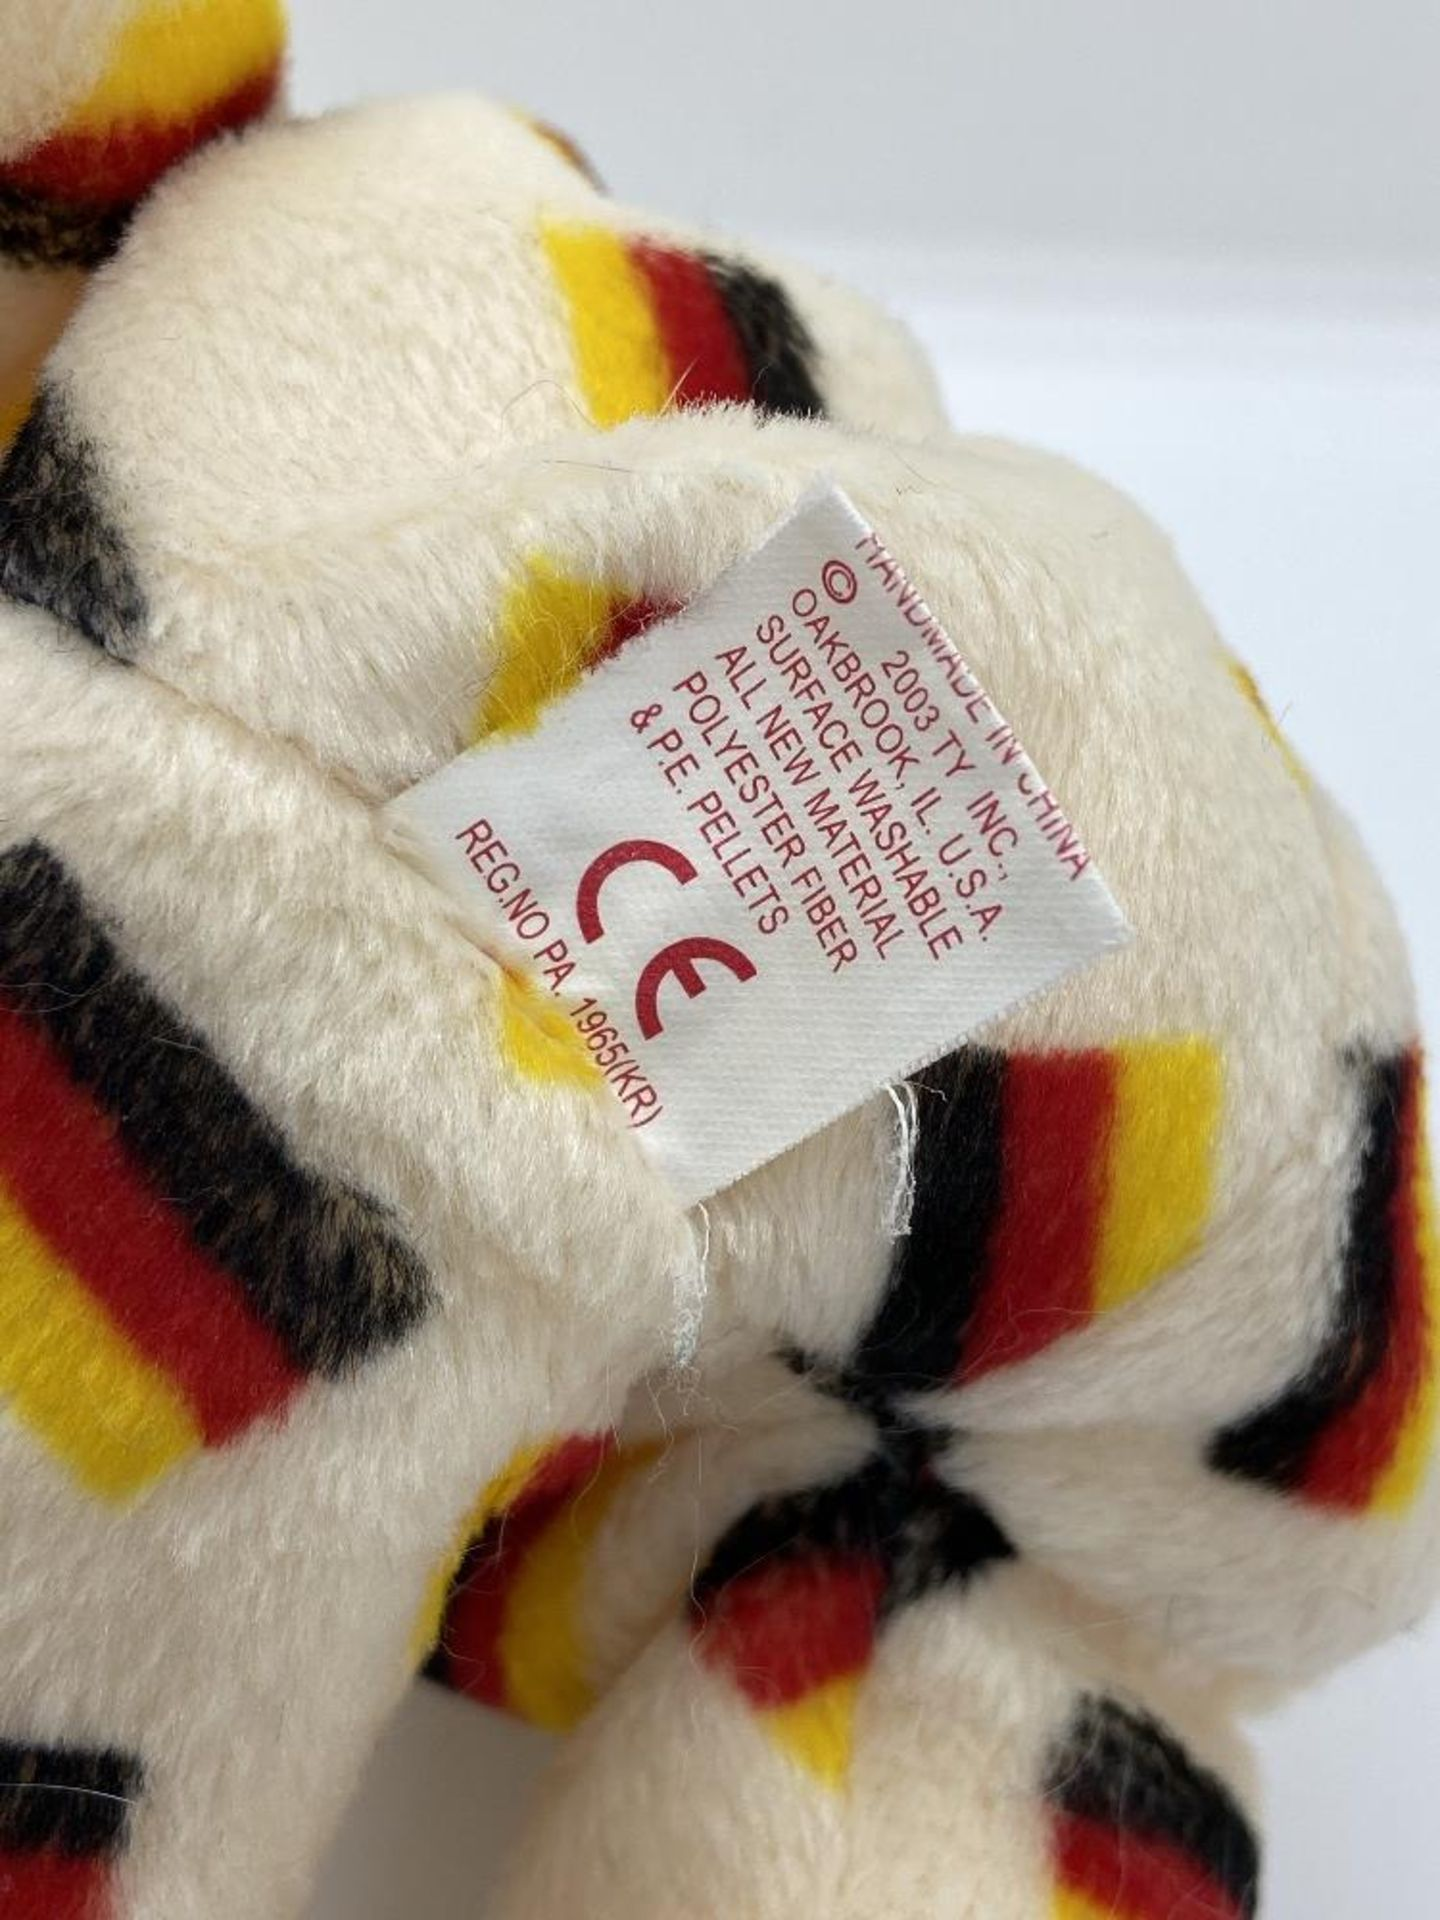 Ty Beanie Babies Deutschland, Germany Flag Bear, 2003 PE Pellets, w/o Hang Tags - Image 6 of 6